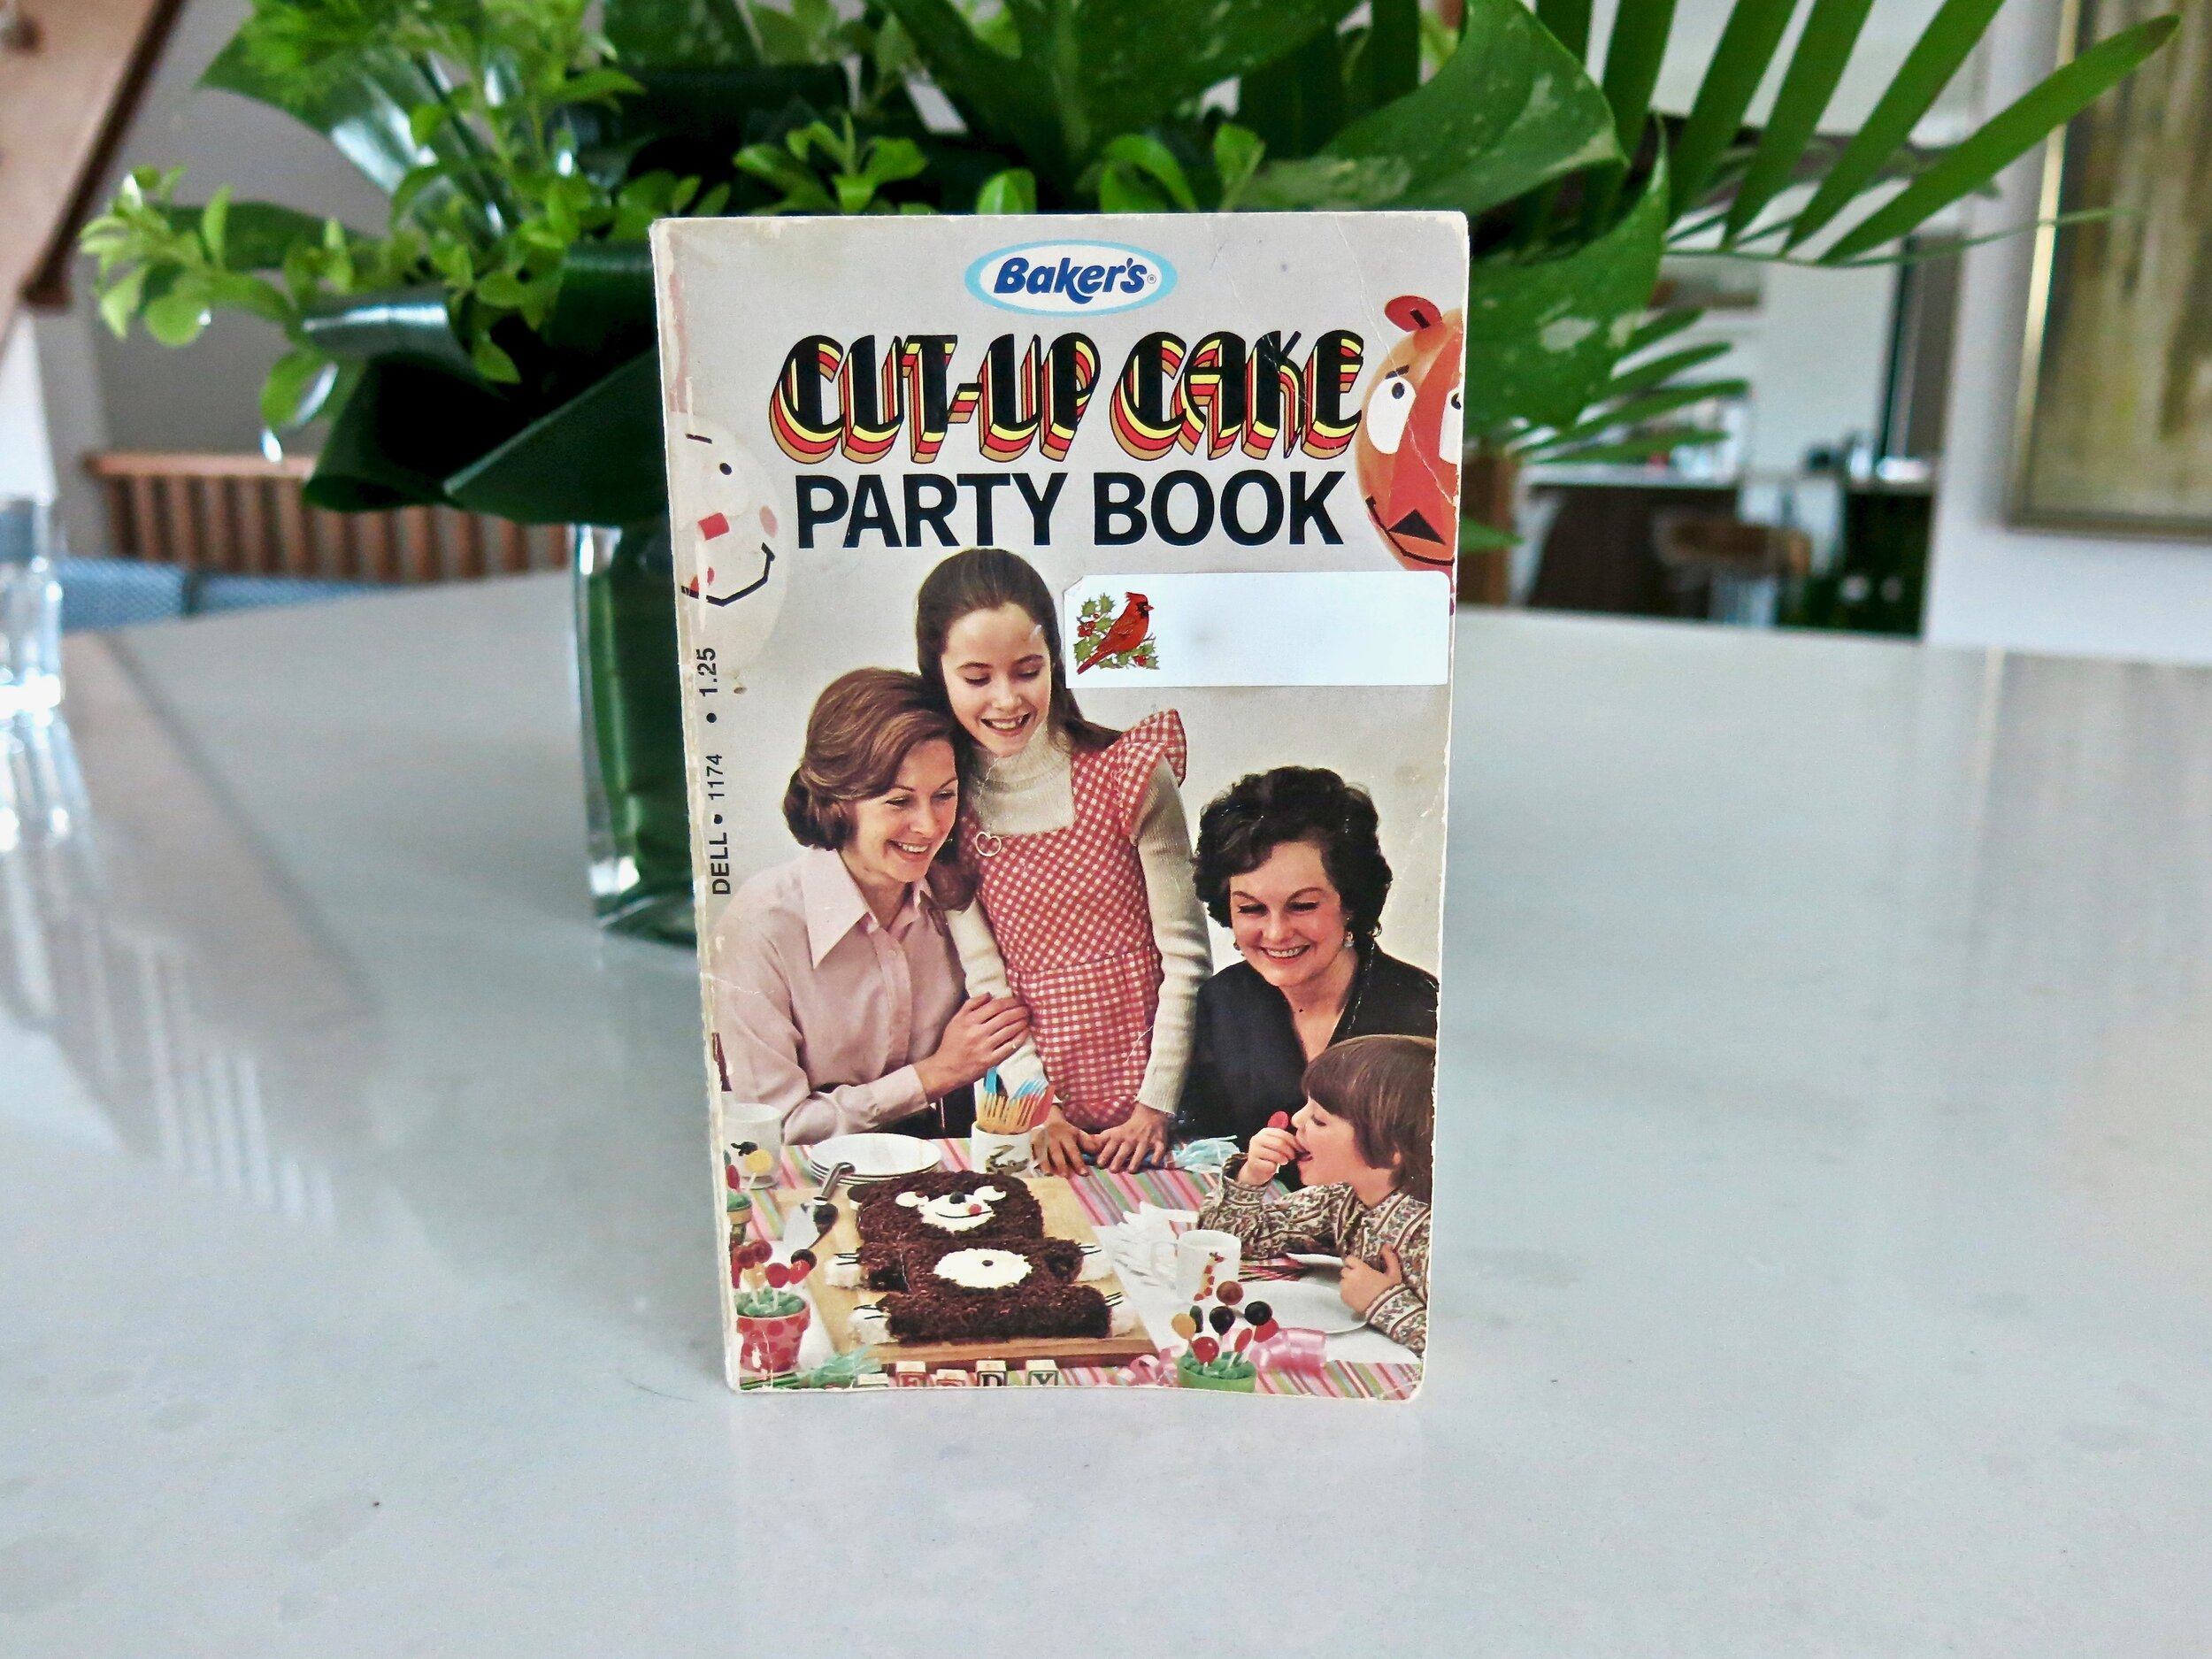 Cut-Up Cake Book.jpeg